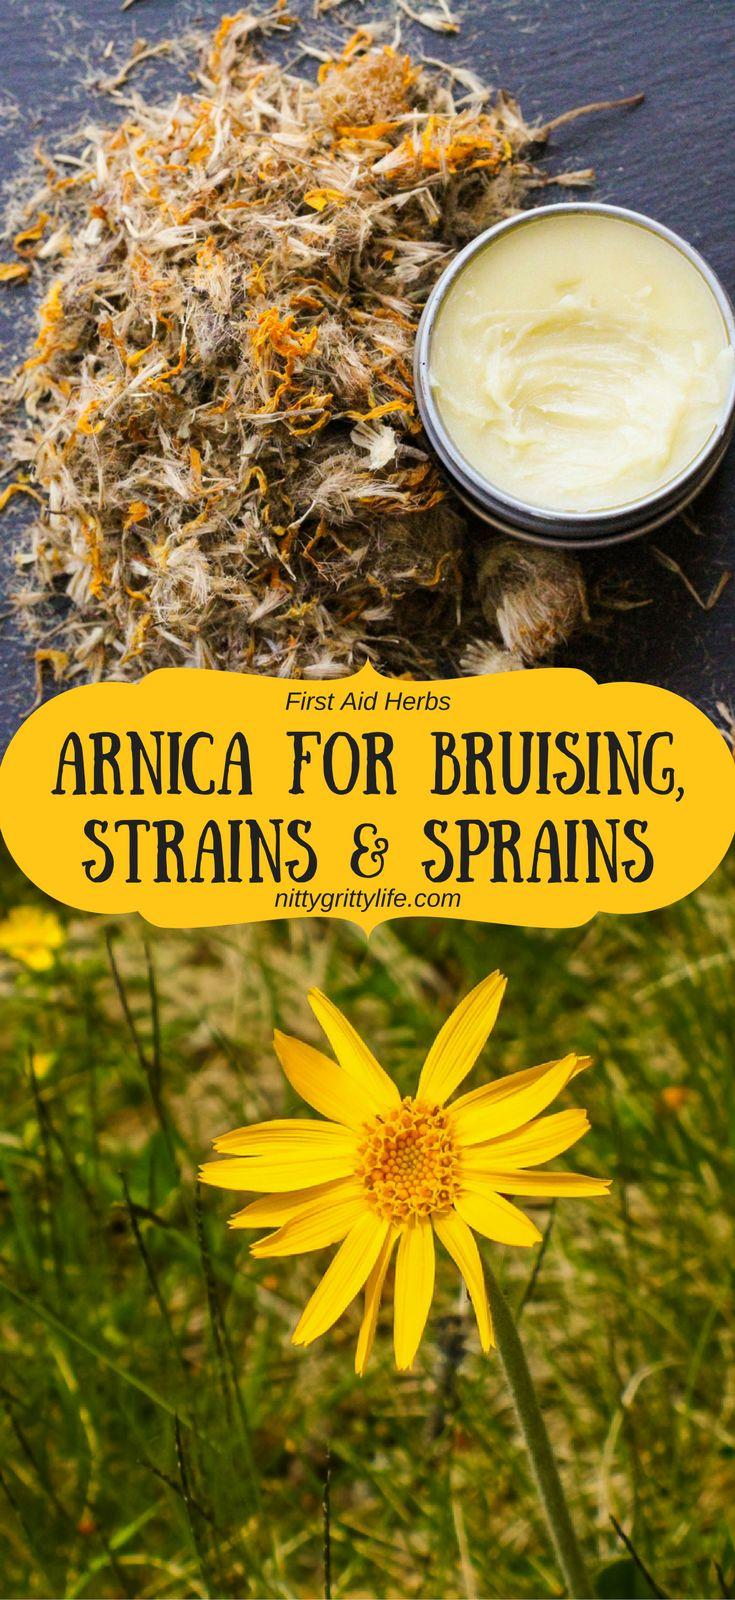 First Aid Herbs: Arnica for Bruising, Strains & Sprains via @nittygrittylife